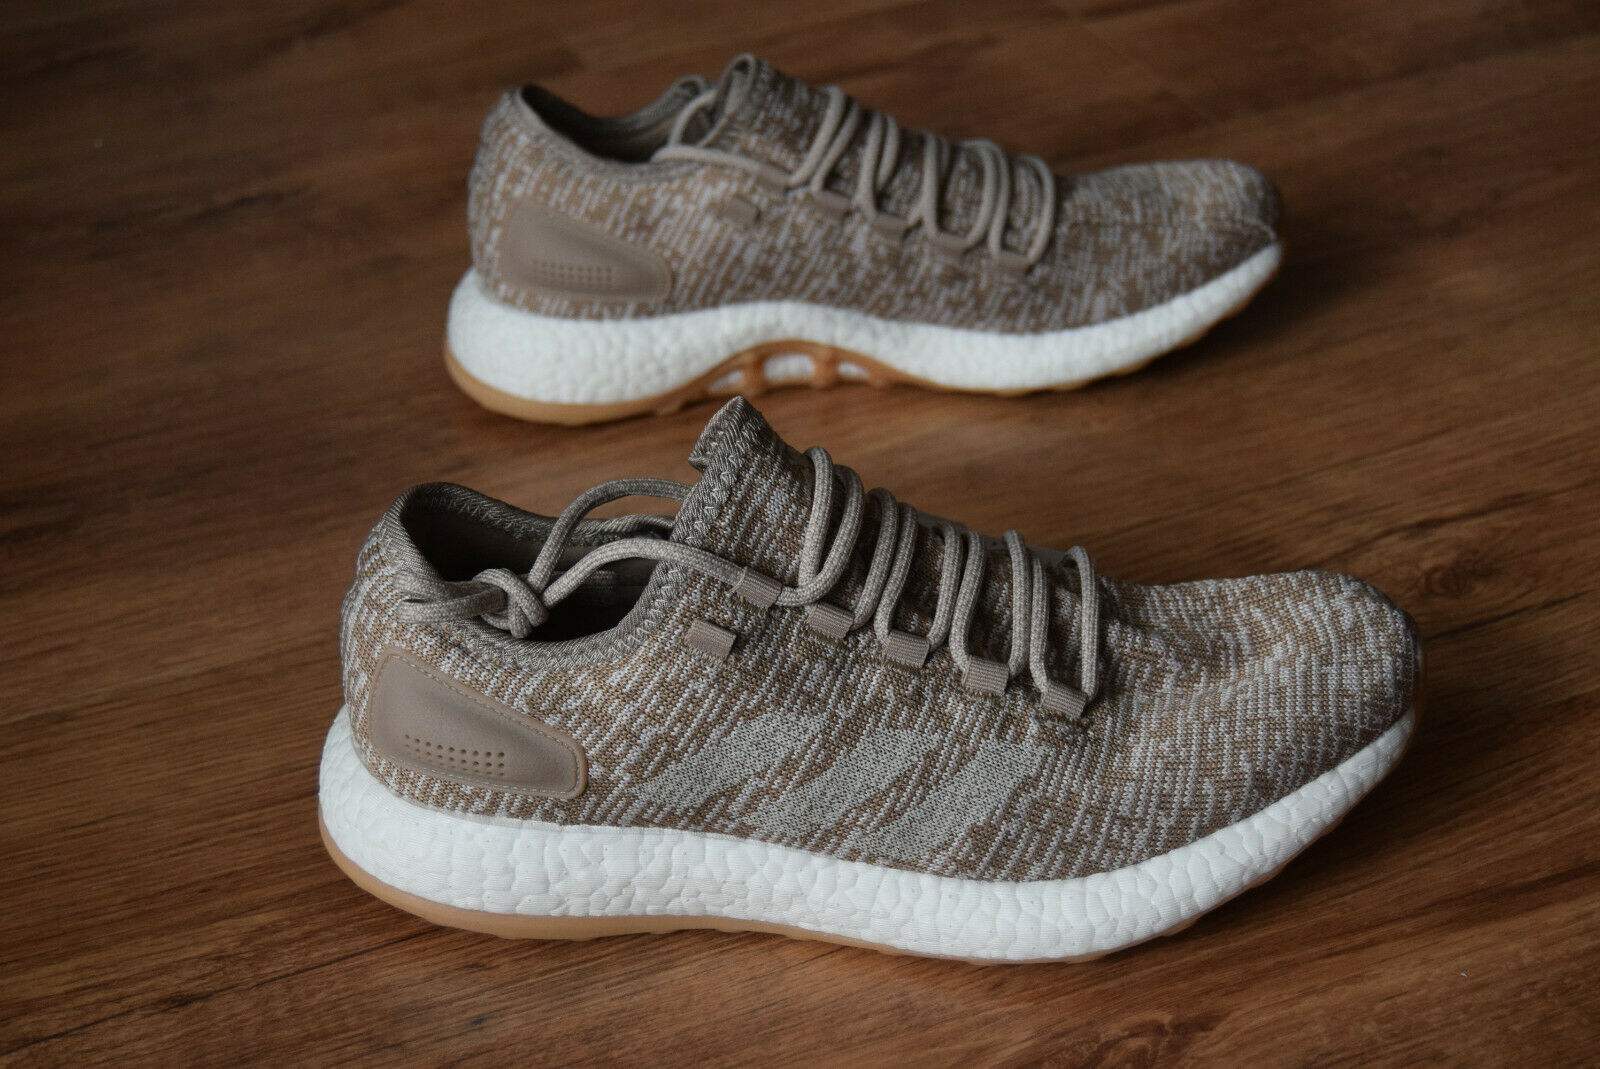 b6490a3fb Adidas pureboost 42 43 44 44,5 45 46,5 Pure s81992 ultra Boost Consortium  nmd r1 nnyszp6179-zapatos nuevos